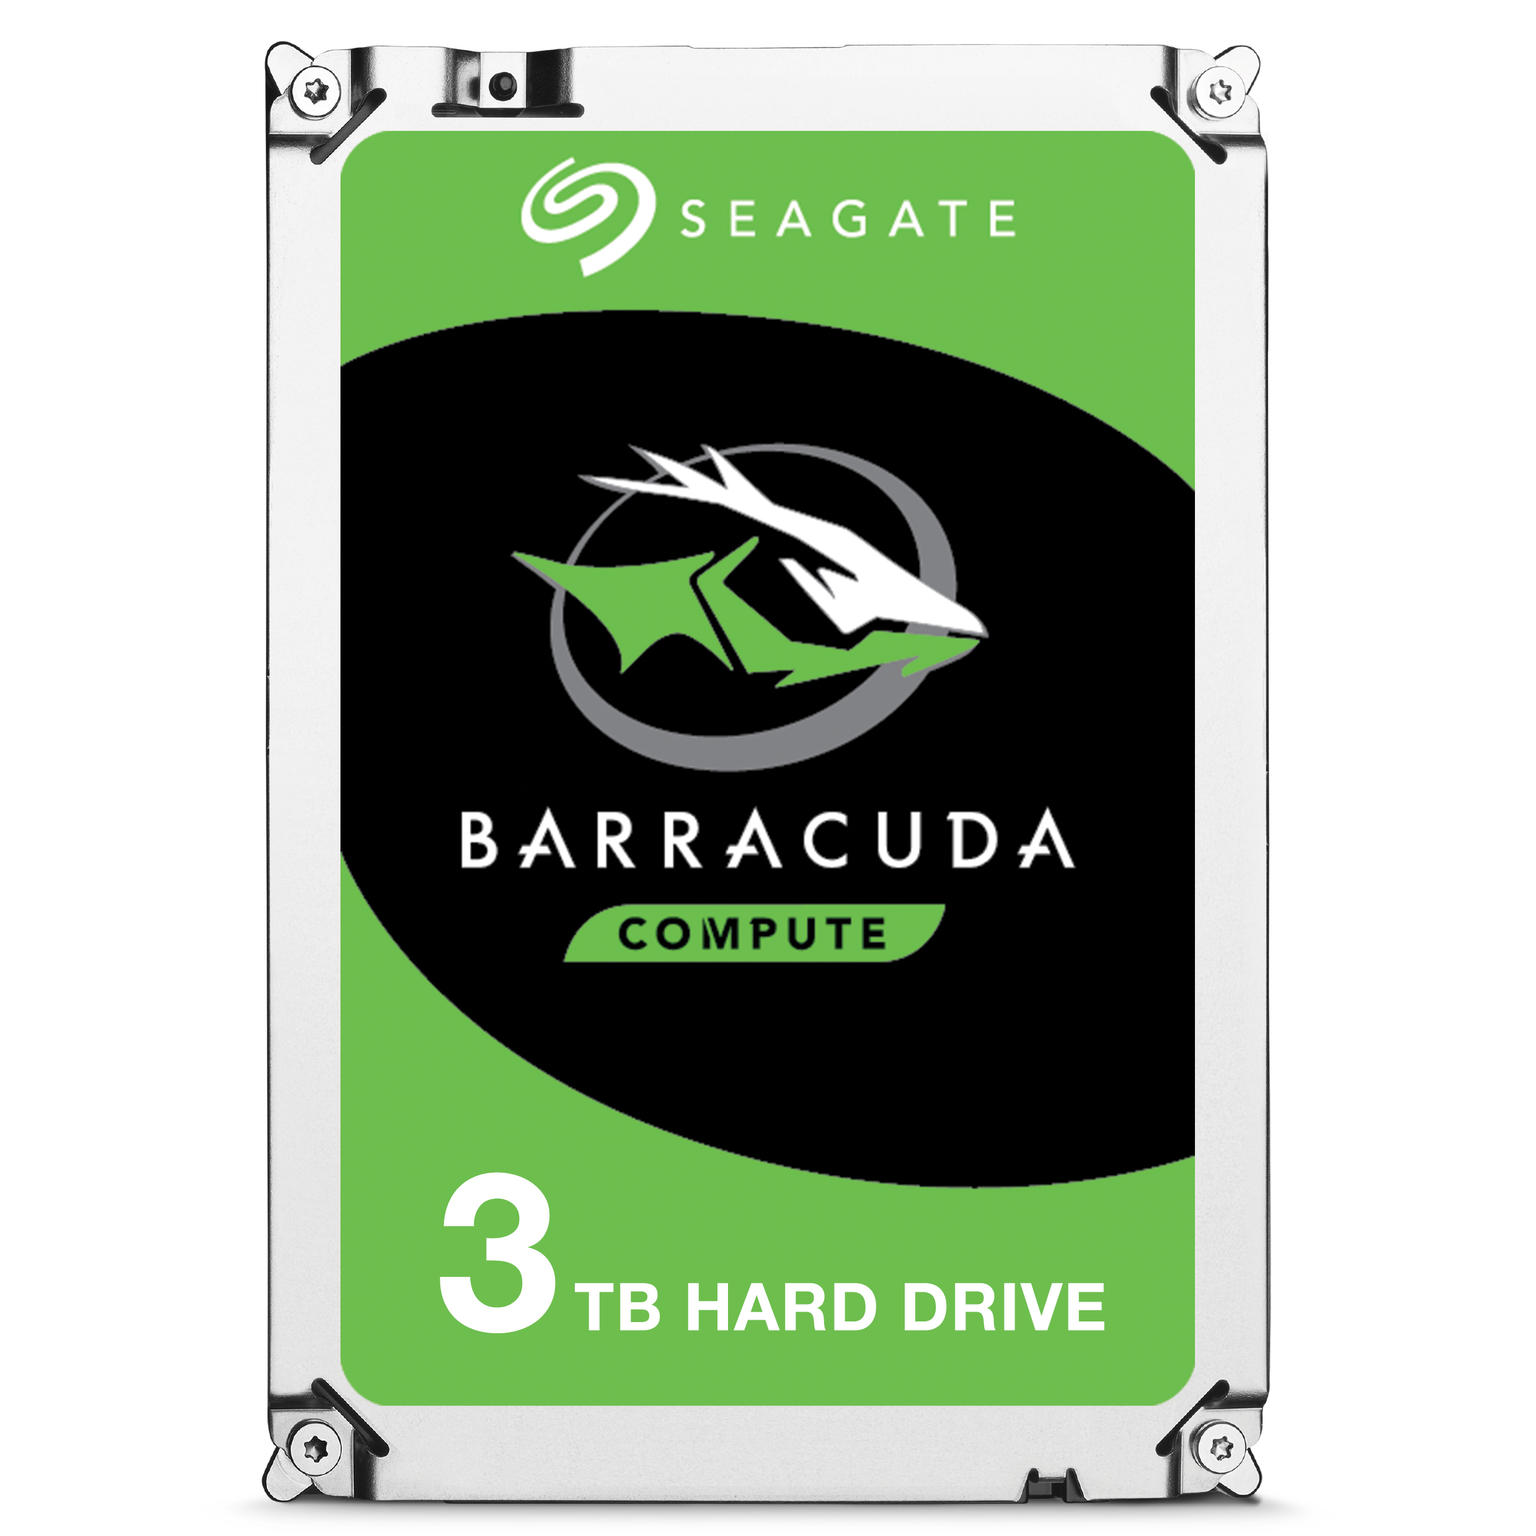 Seagate Barracuda ST3000DM007 3000GB SATA III interne harde schijf